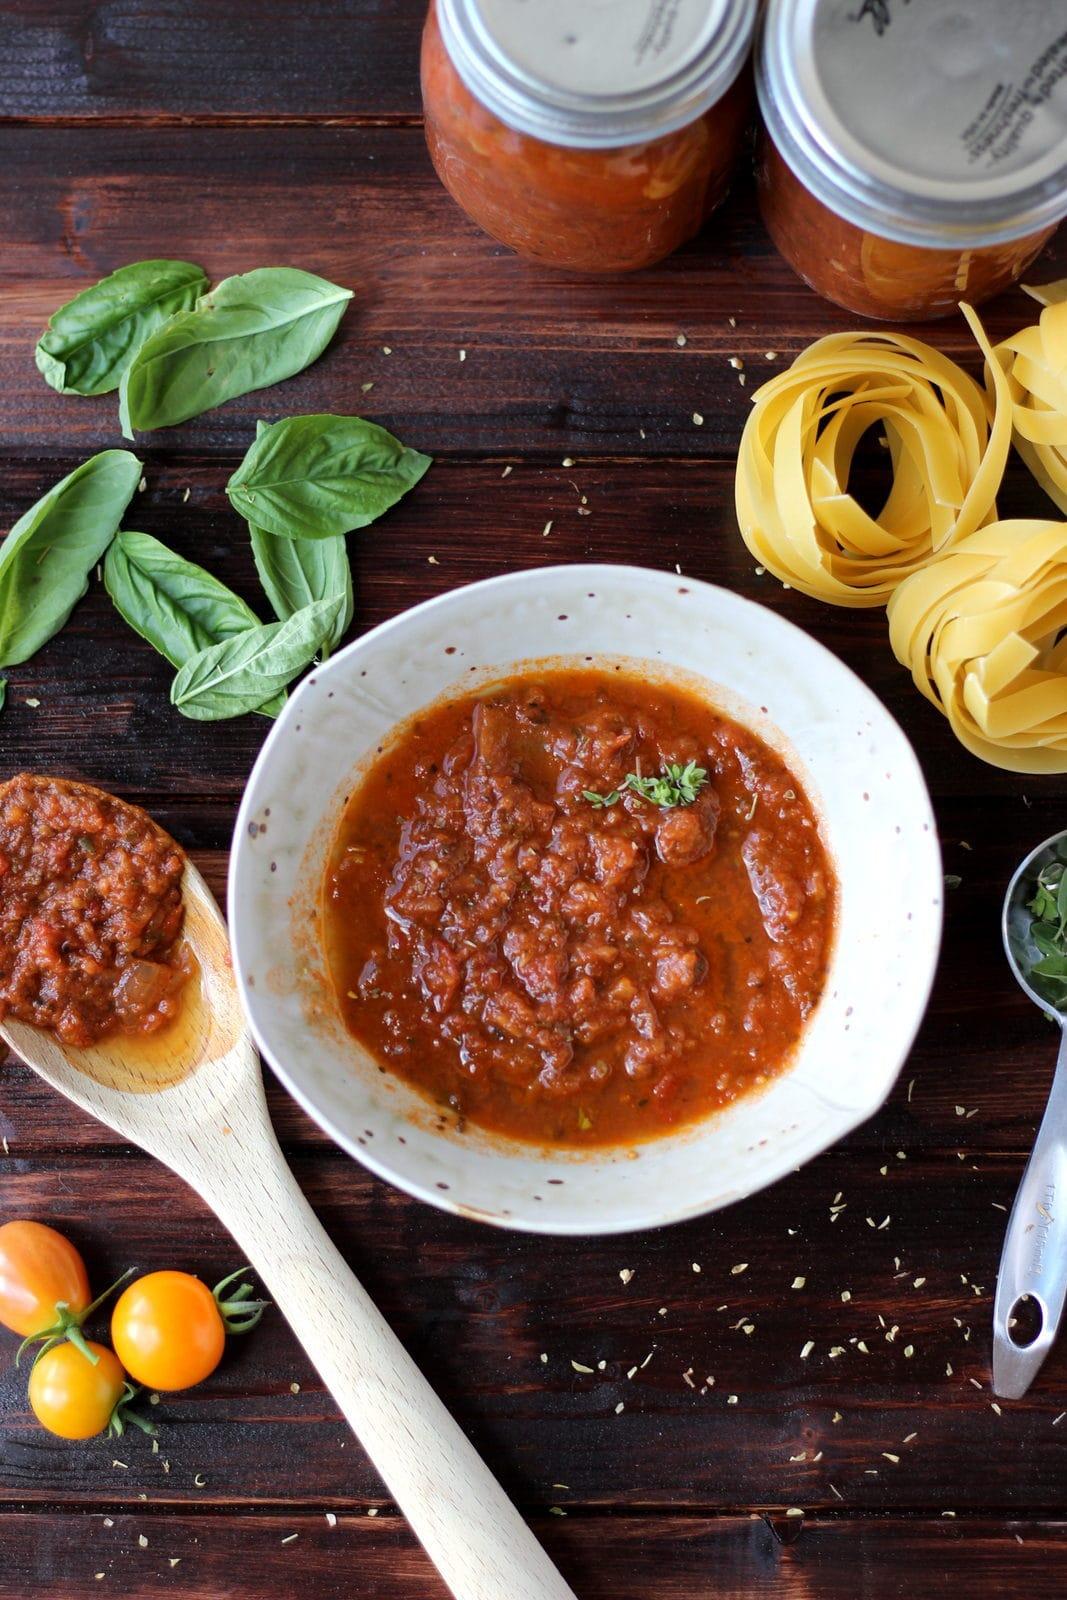 Homemade Marinara Sauce - thewoodenskillet.com #spaghettisauce #homemade #pastsa